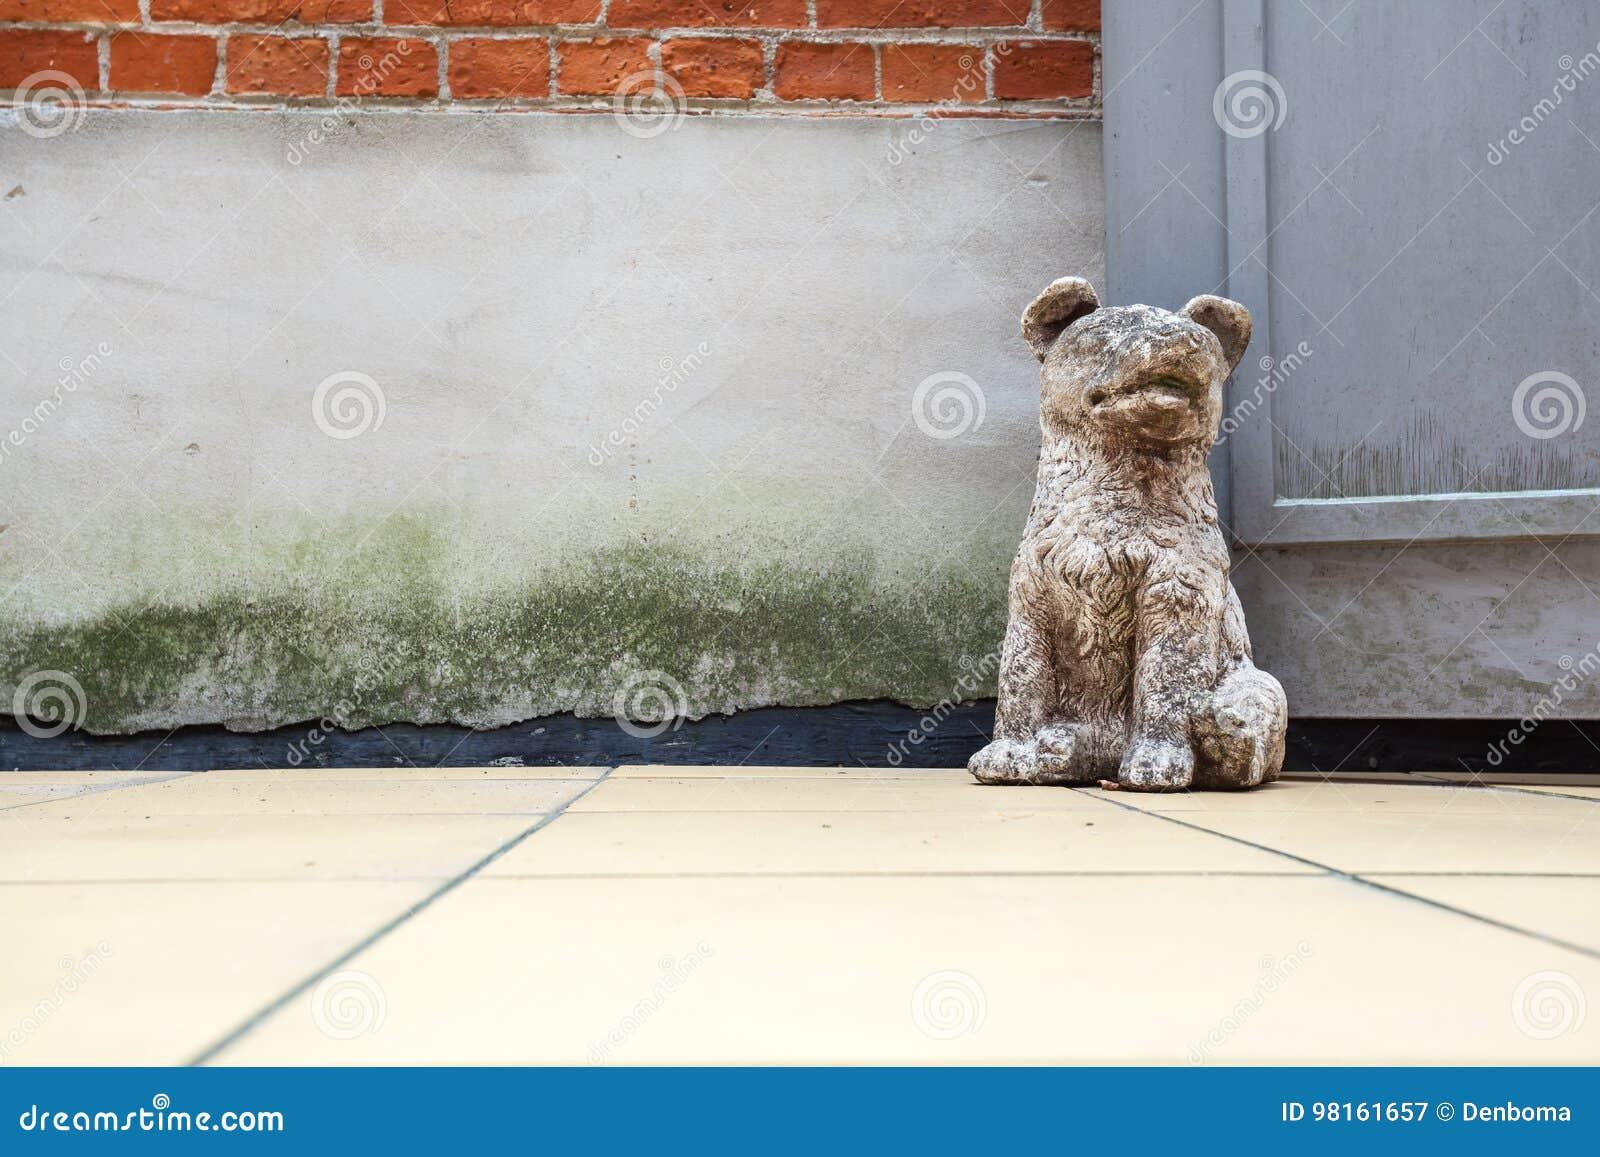 Dog Door Stop Stock Image Image Of Interior Construction 98161657